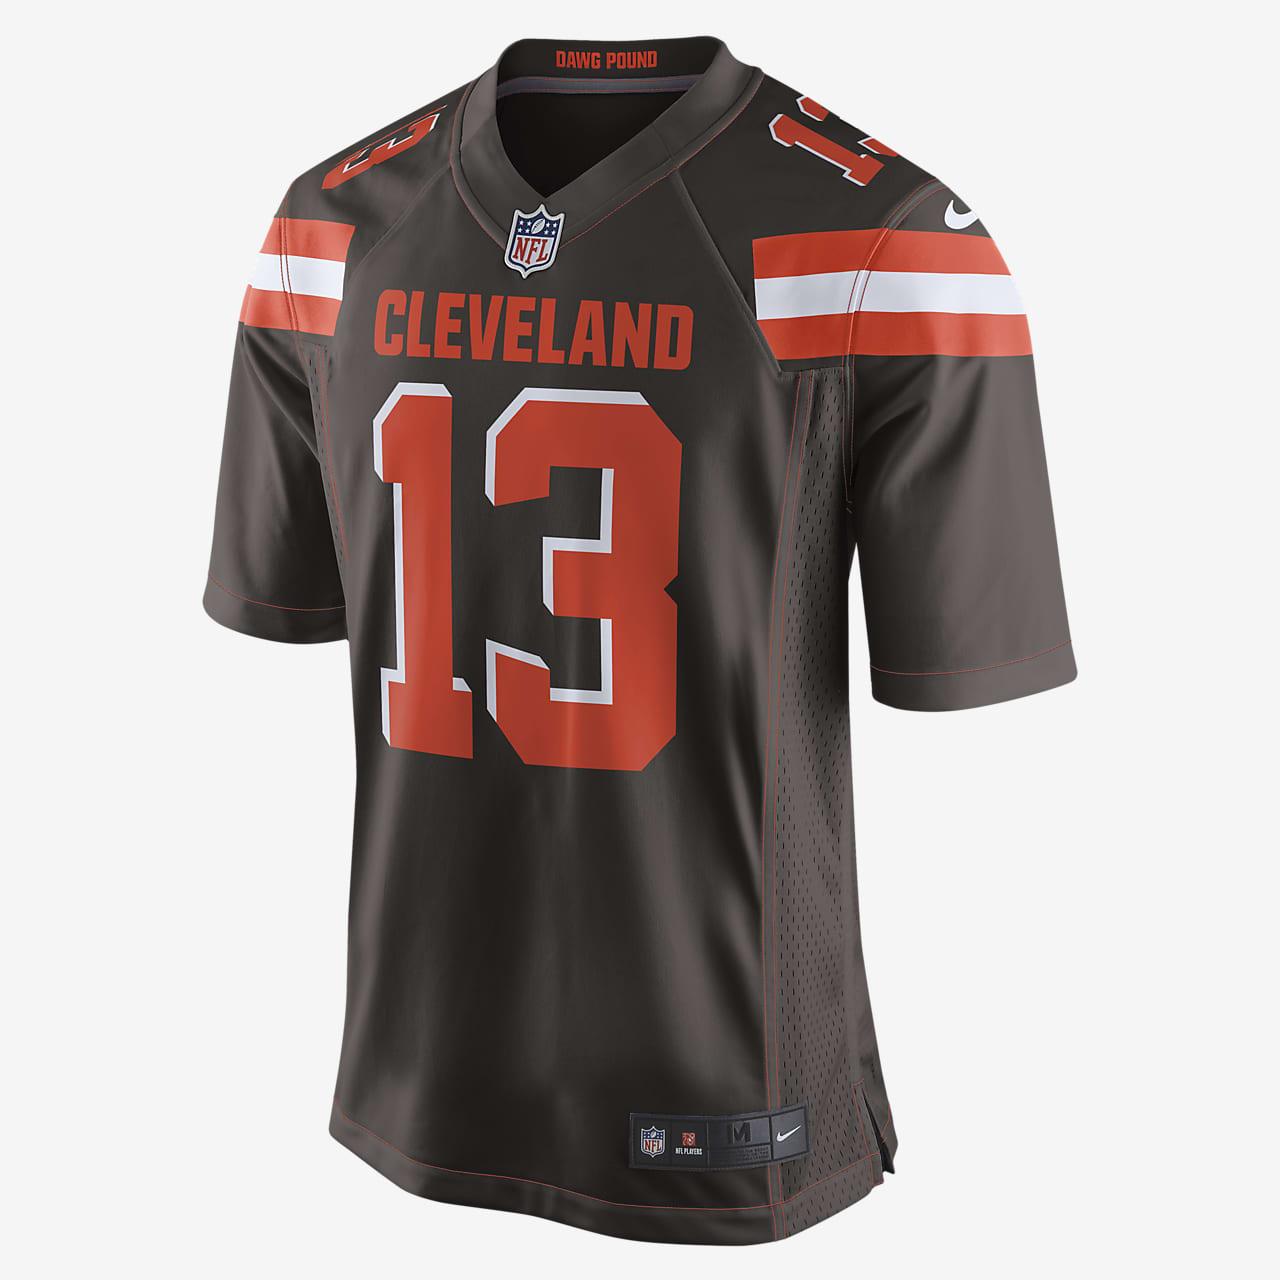 calentar George Eliot sufrimiento  NFL Cleveland Browns (Odell Beckham Jr.) Camiseta de fútbol americano -  Hombre. Nike ES